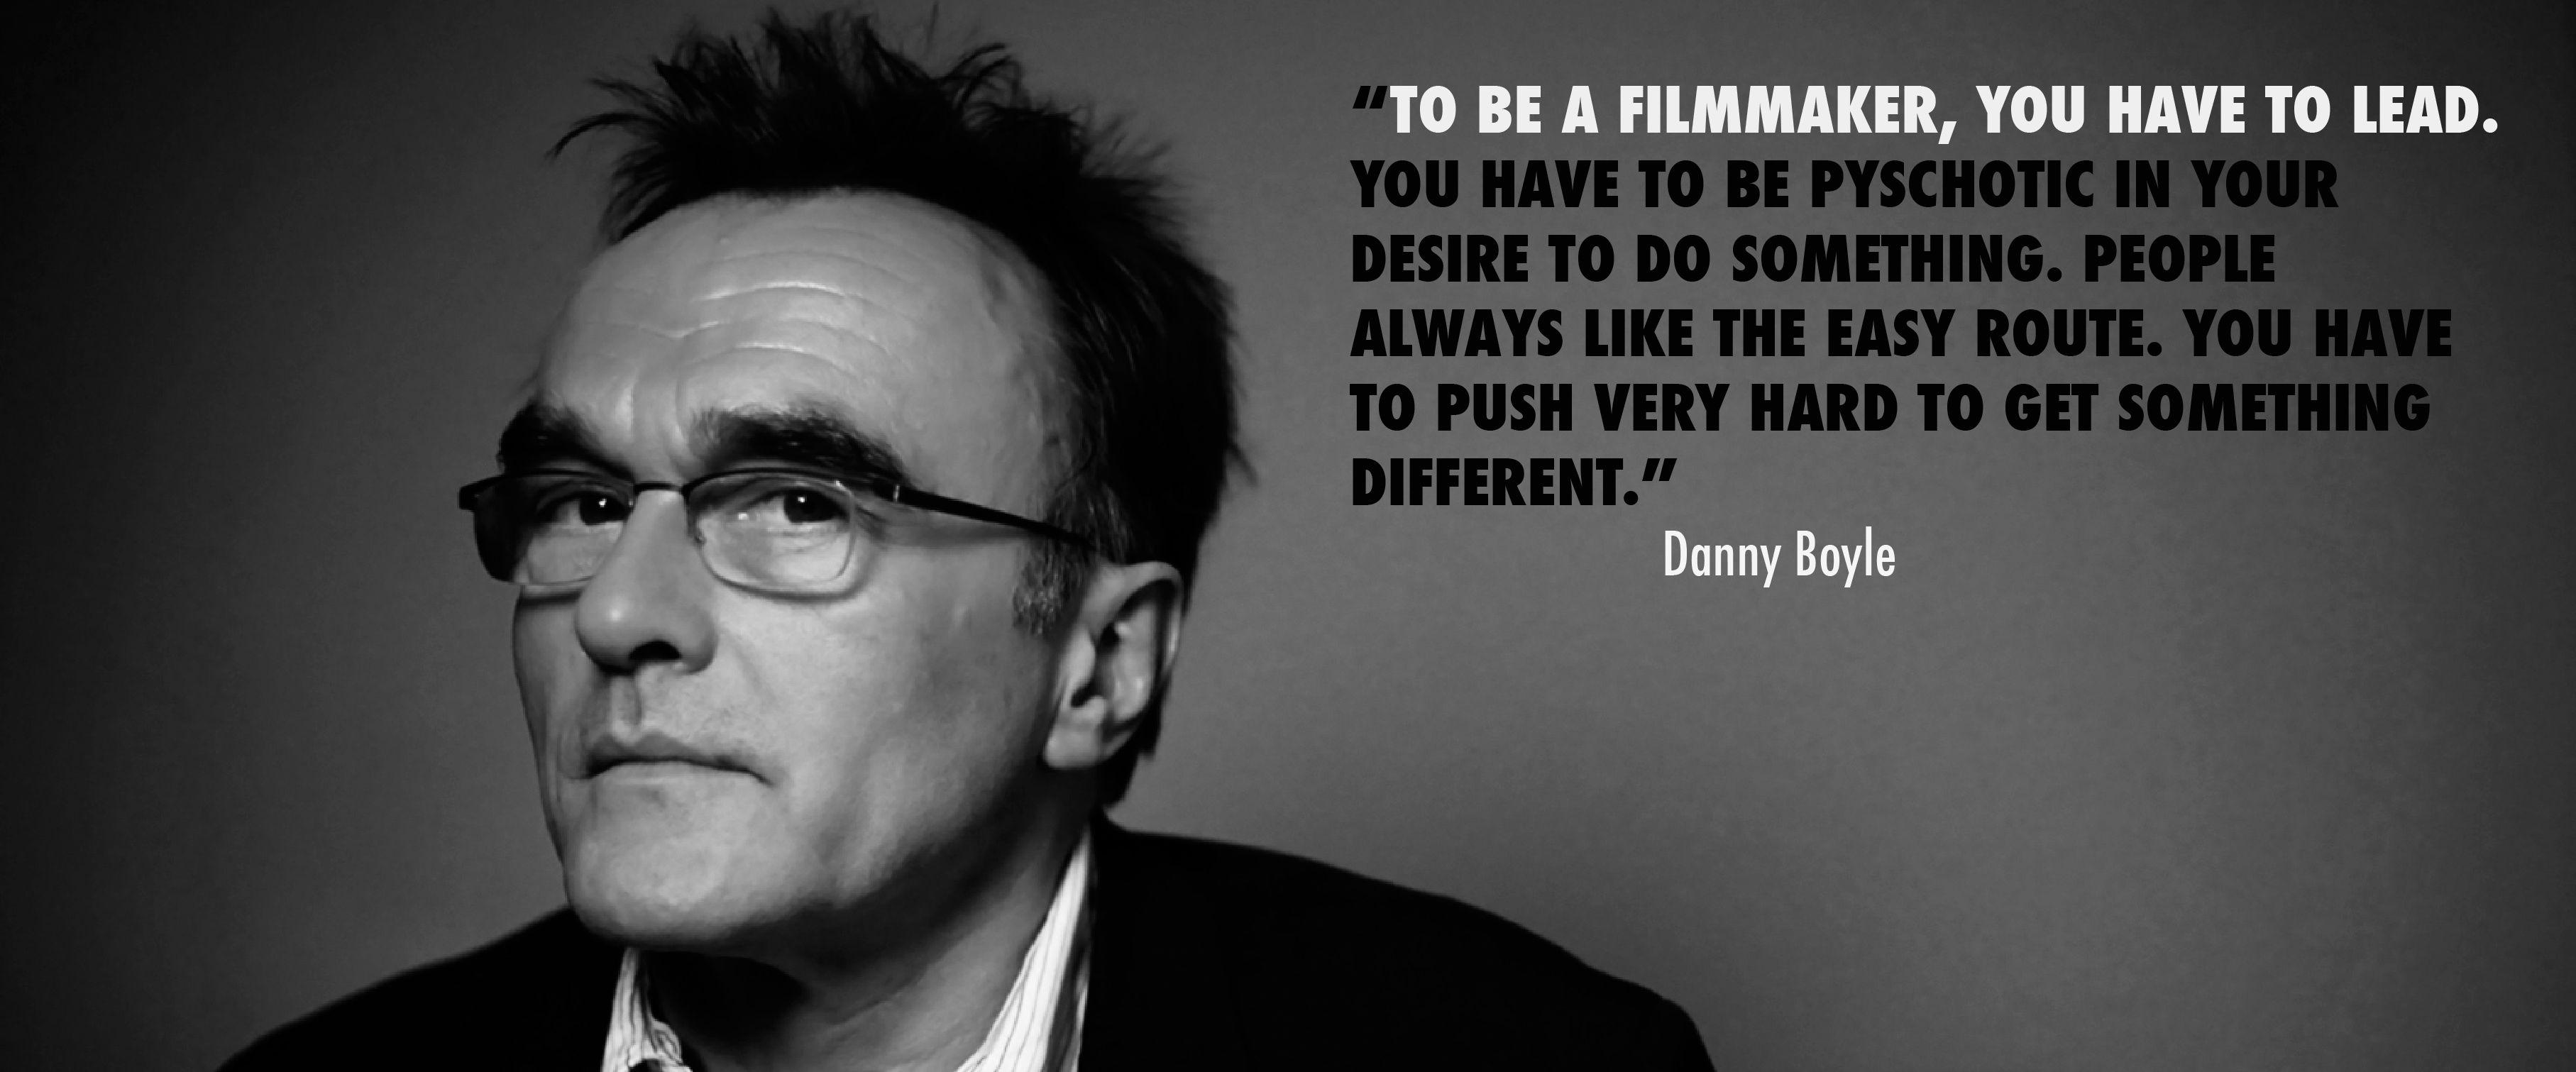 Danny Boyle Film Director quoteoftheday filmdirector